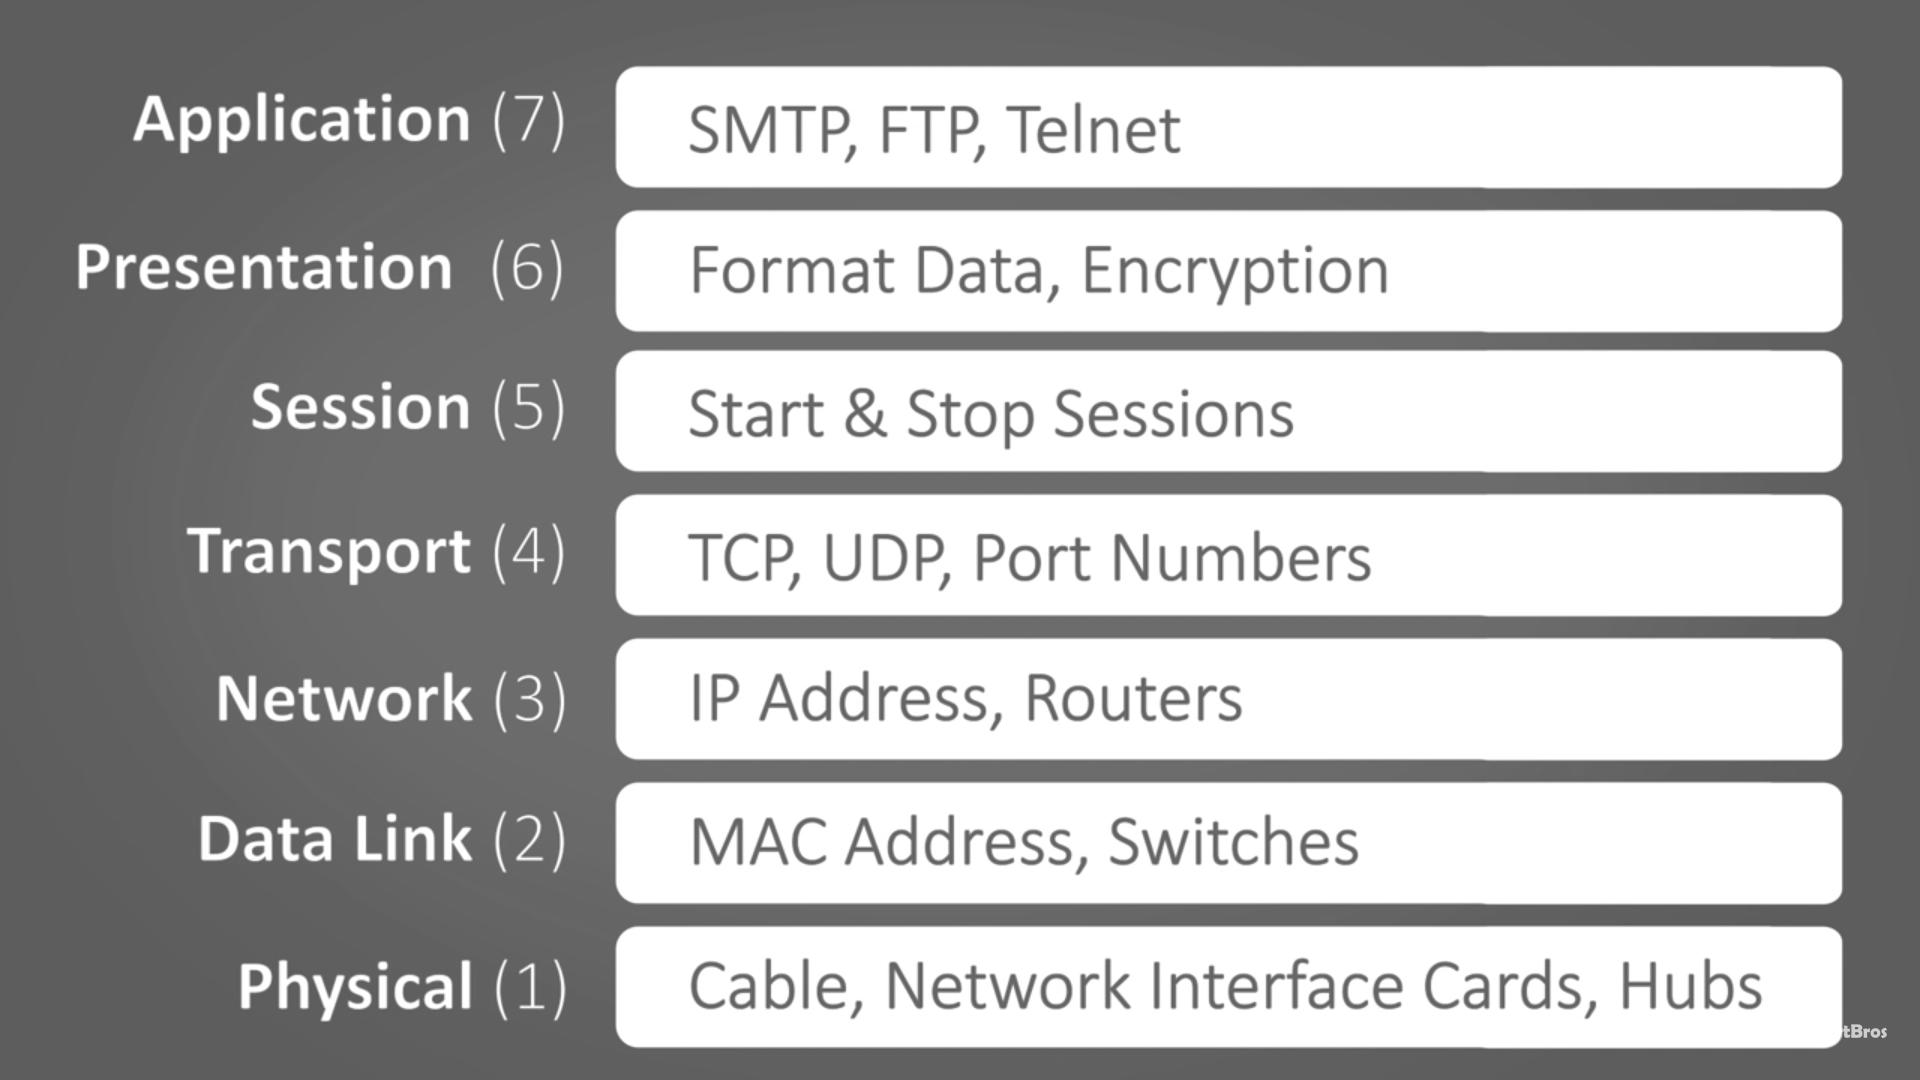 HTTP,SMTP,FTP,TCP,UDP,...